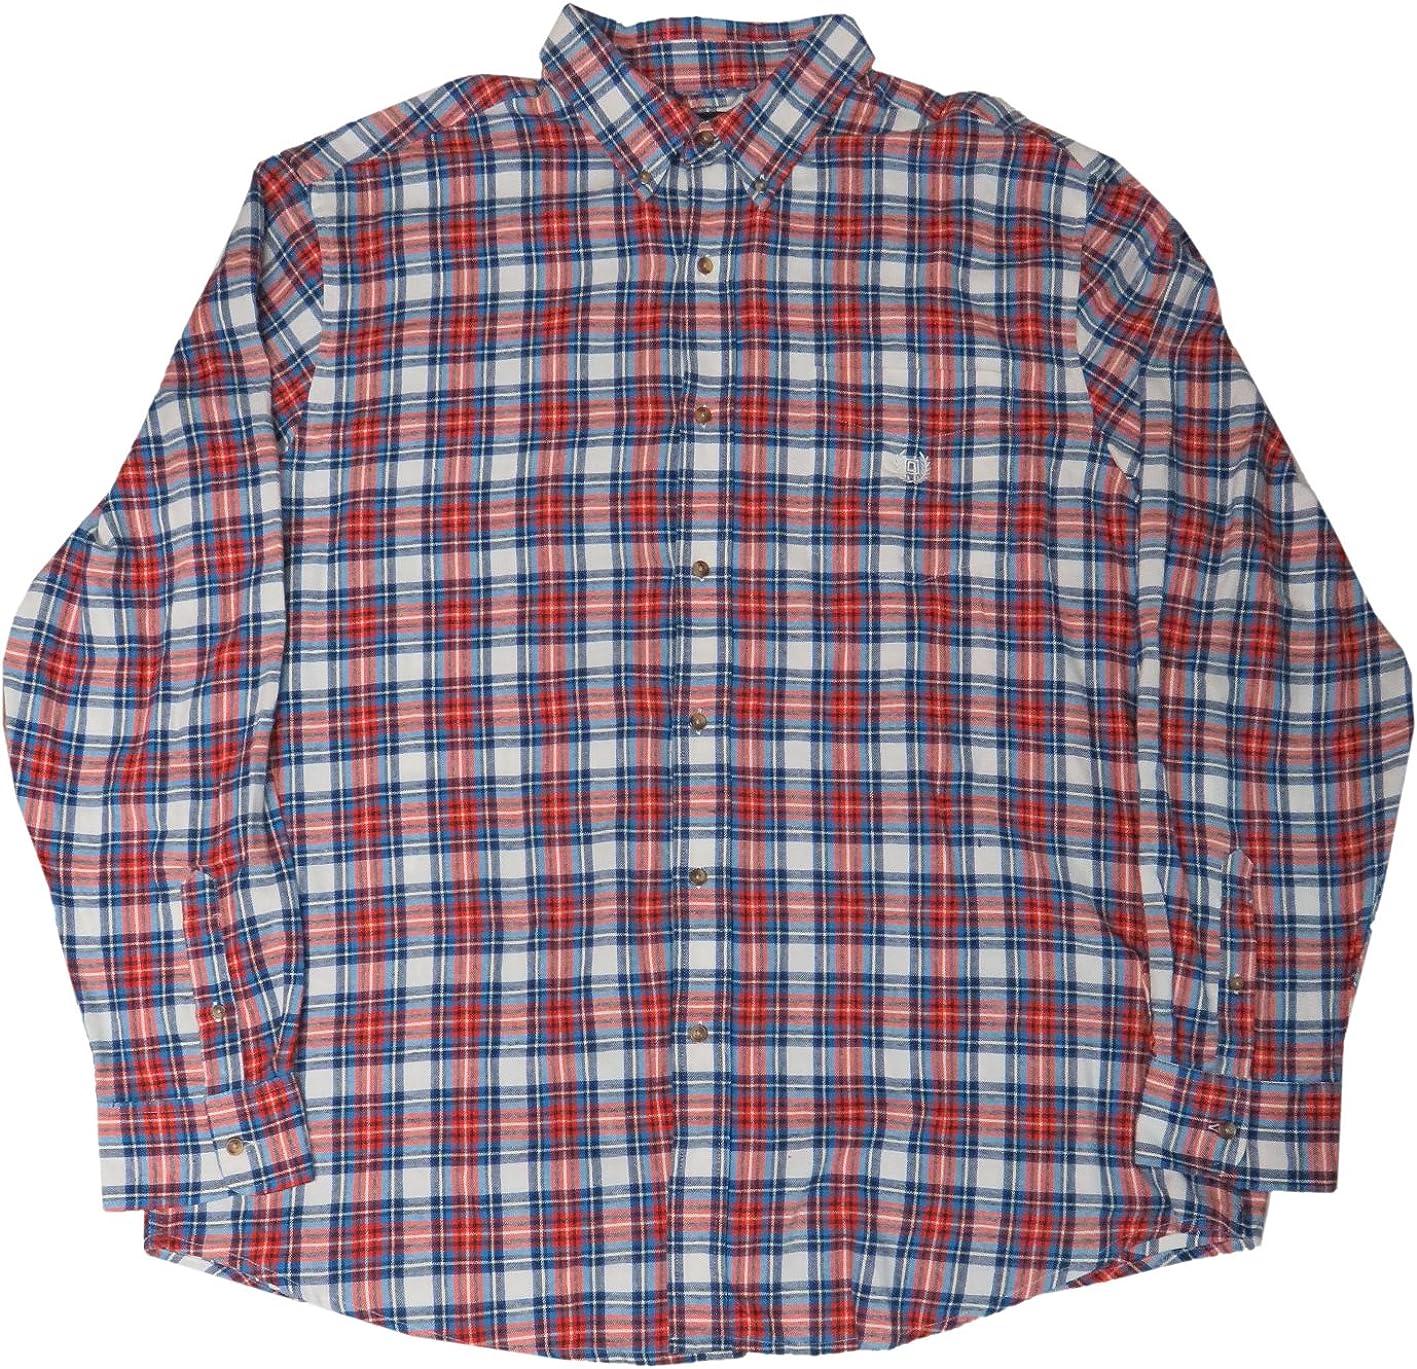 Big & Tall Classic-Fit Plaid Flannel Button-Down Shirt